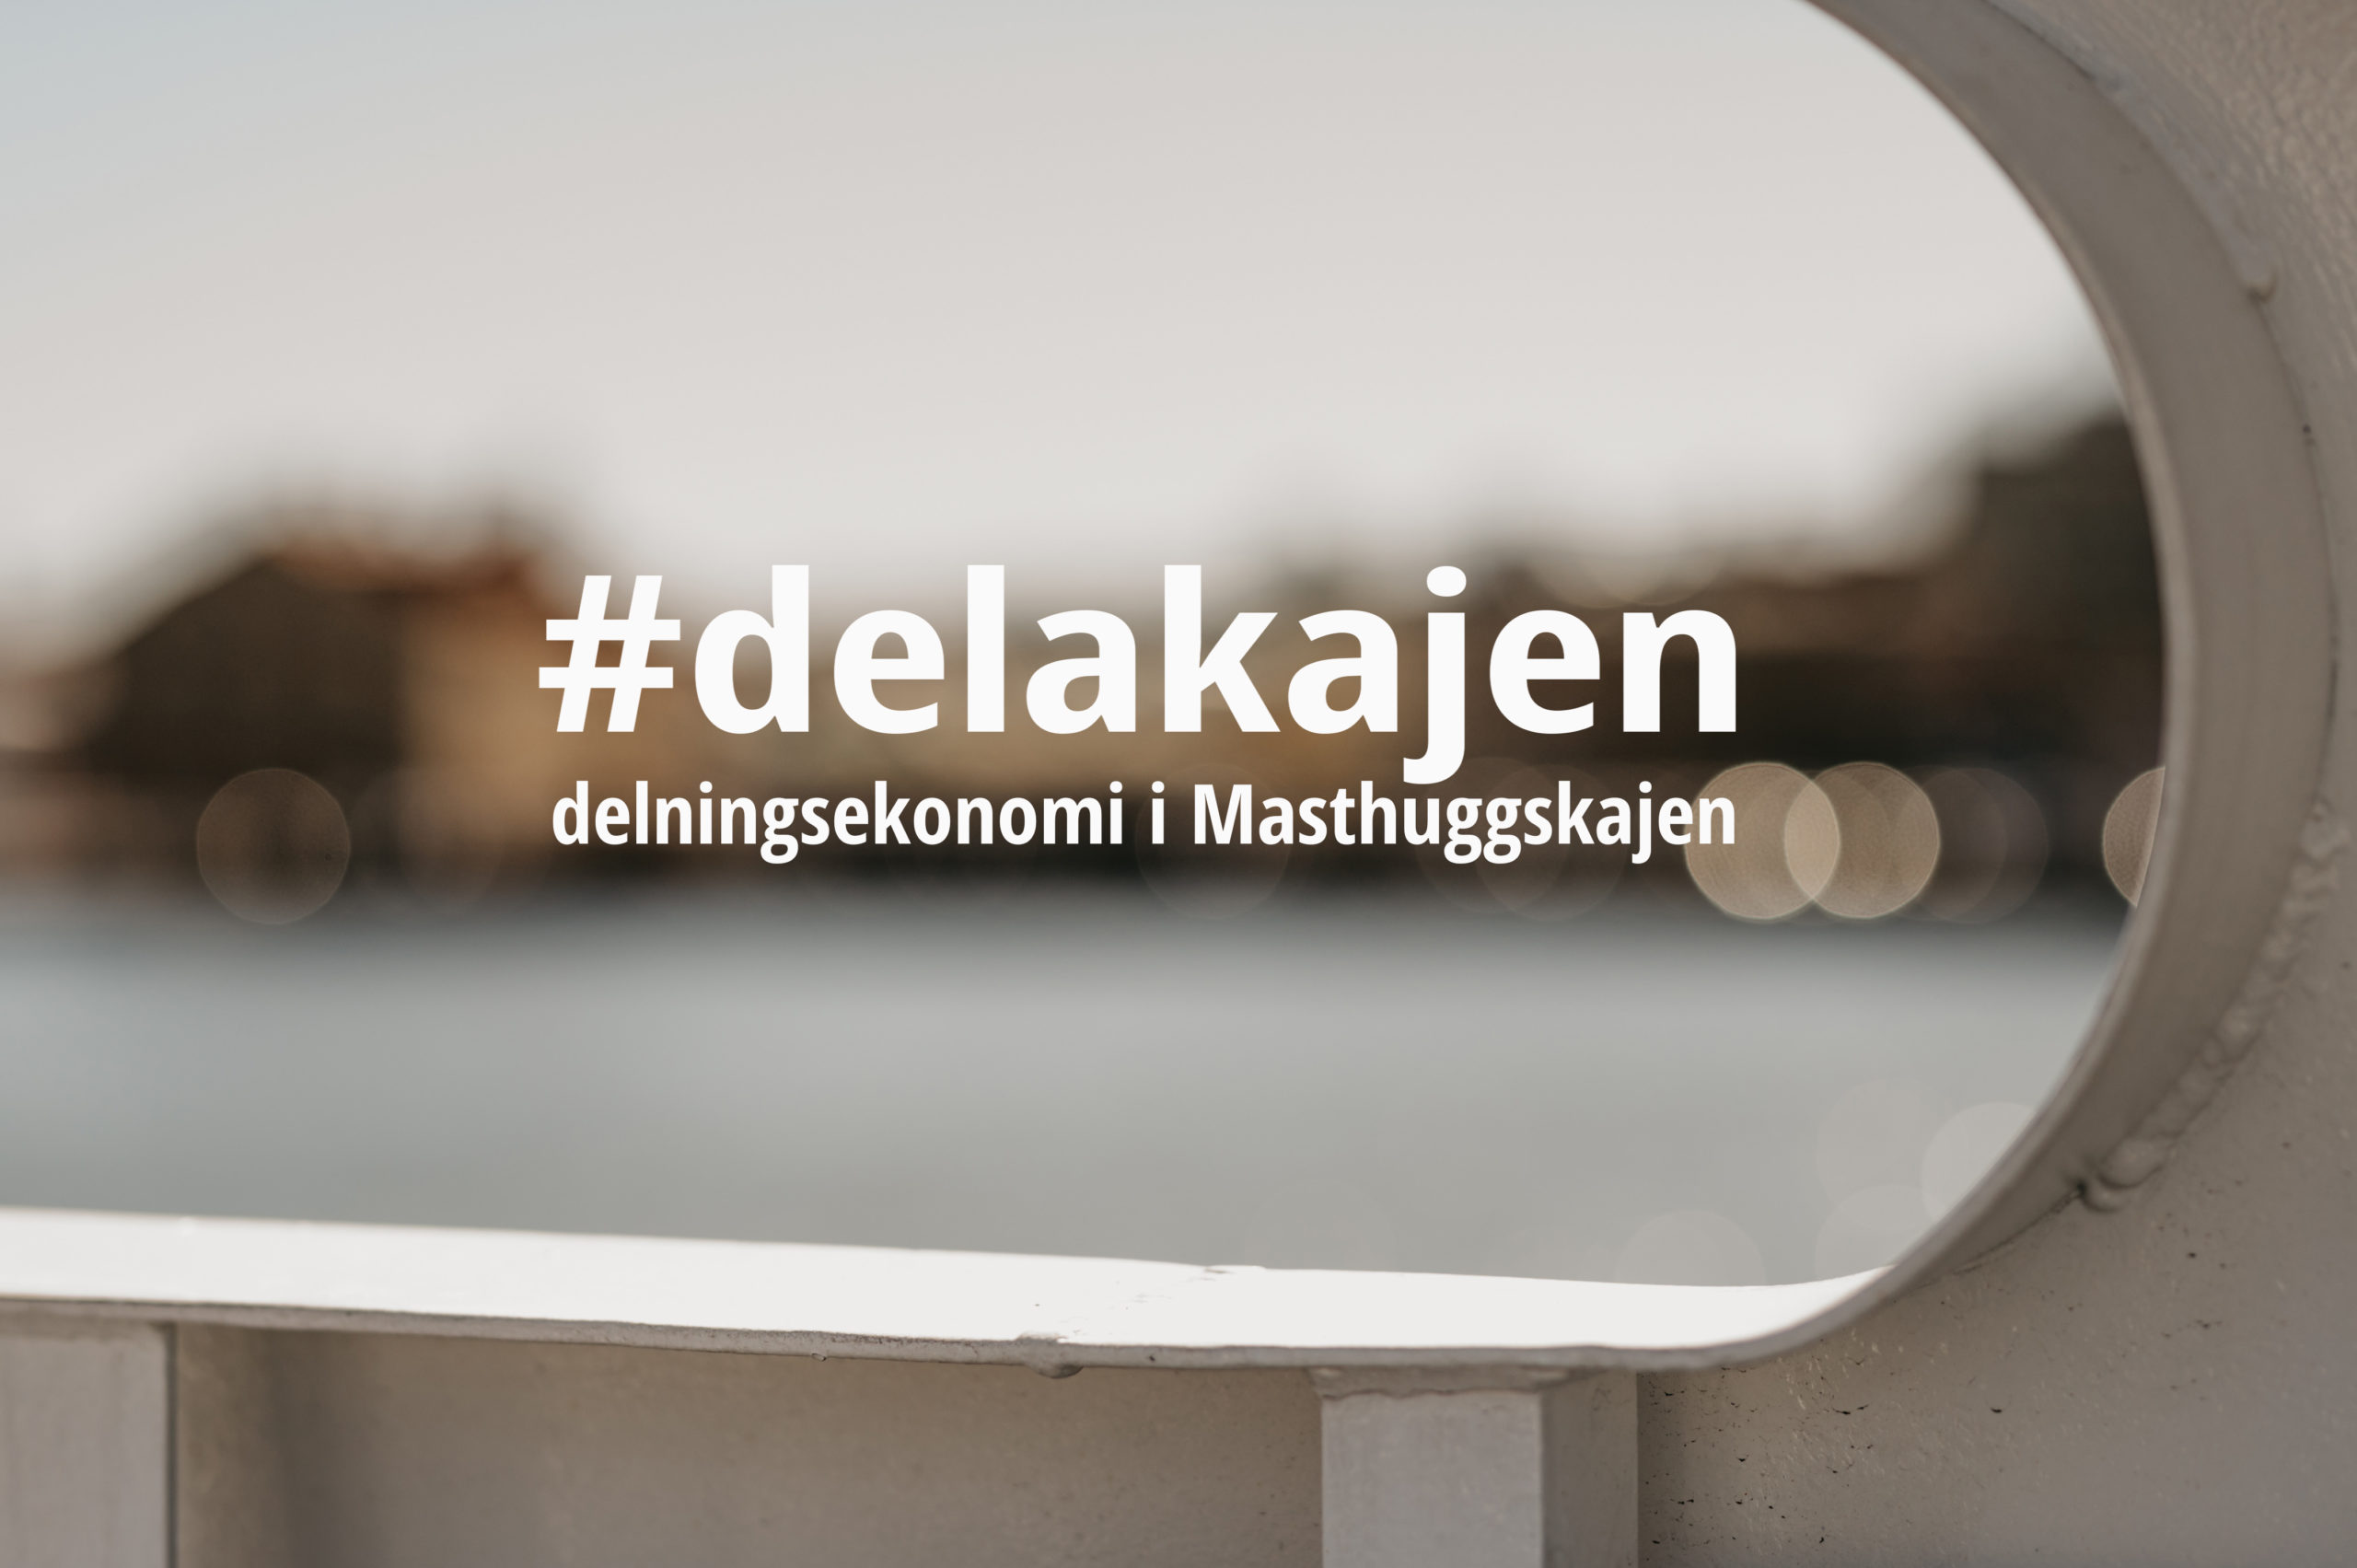 Bild På Suddig Kaj Med Hashtaggen #delakajen I Förgrunden.